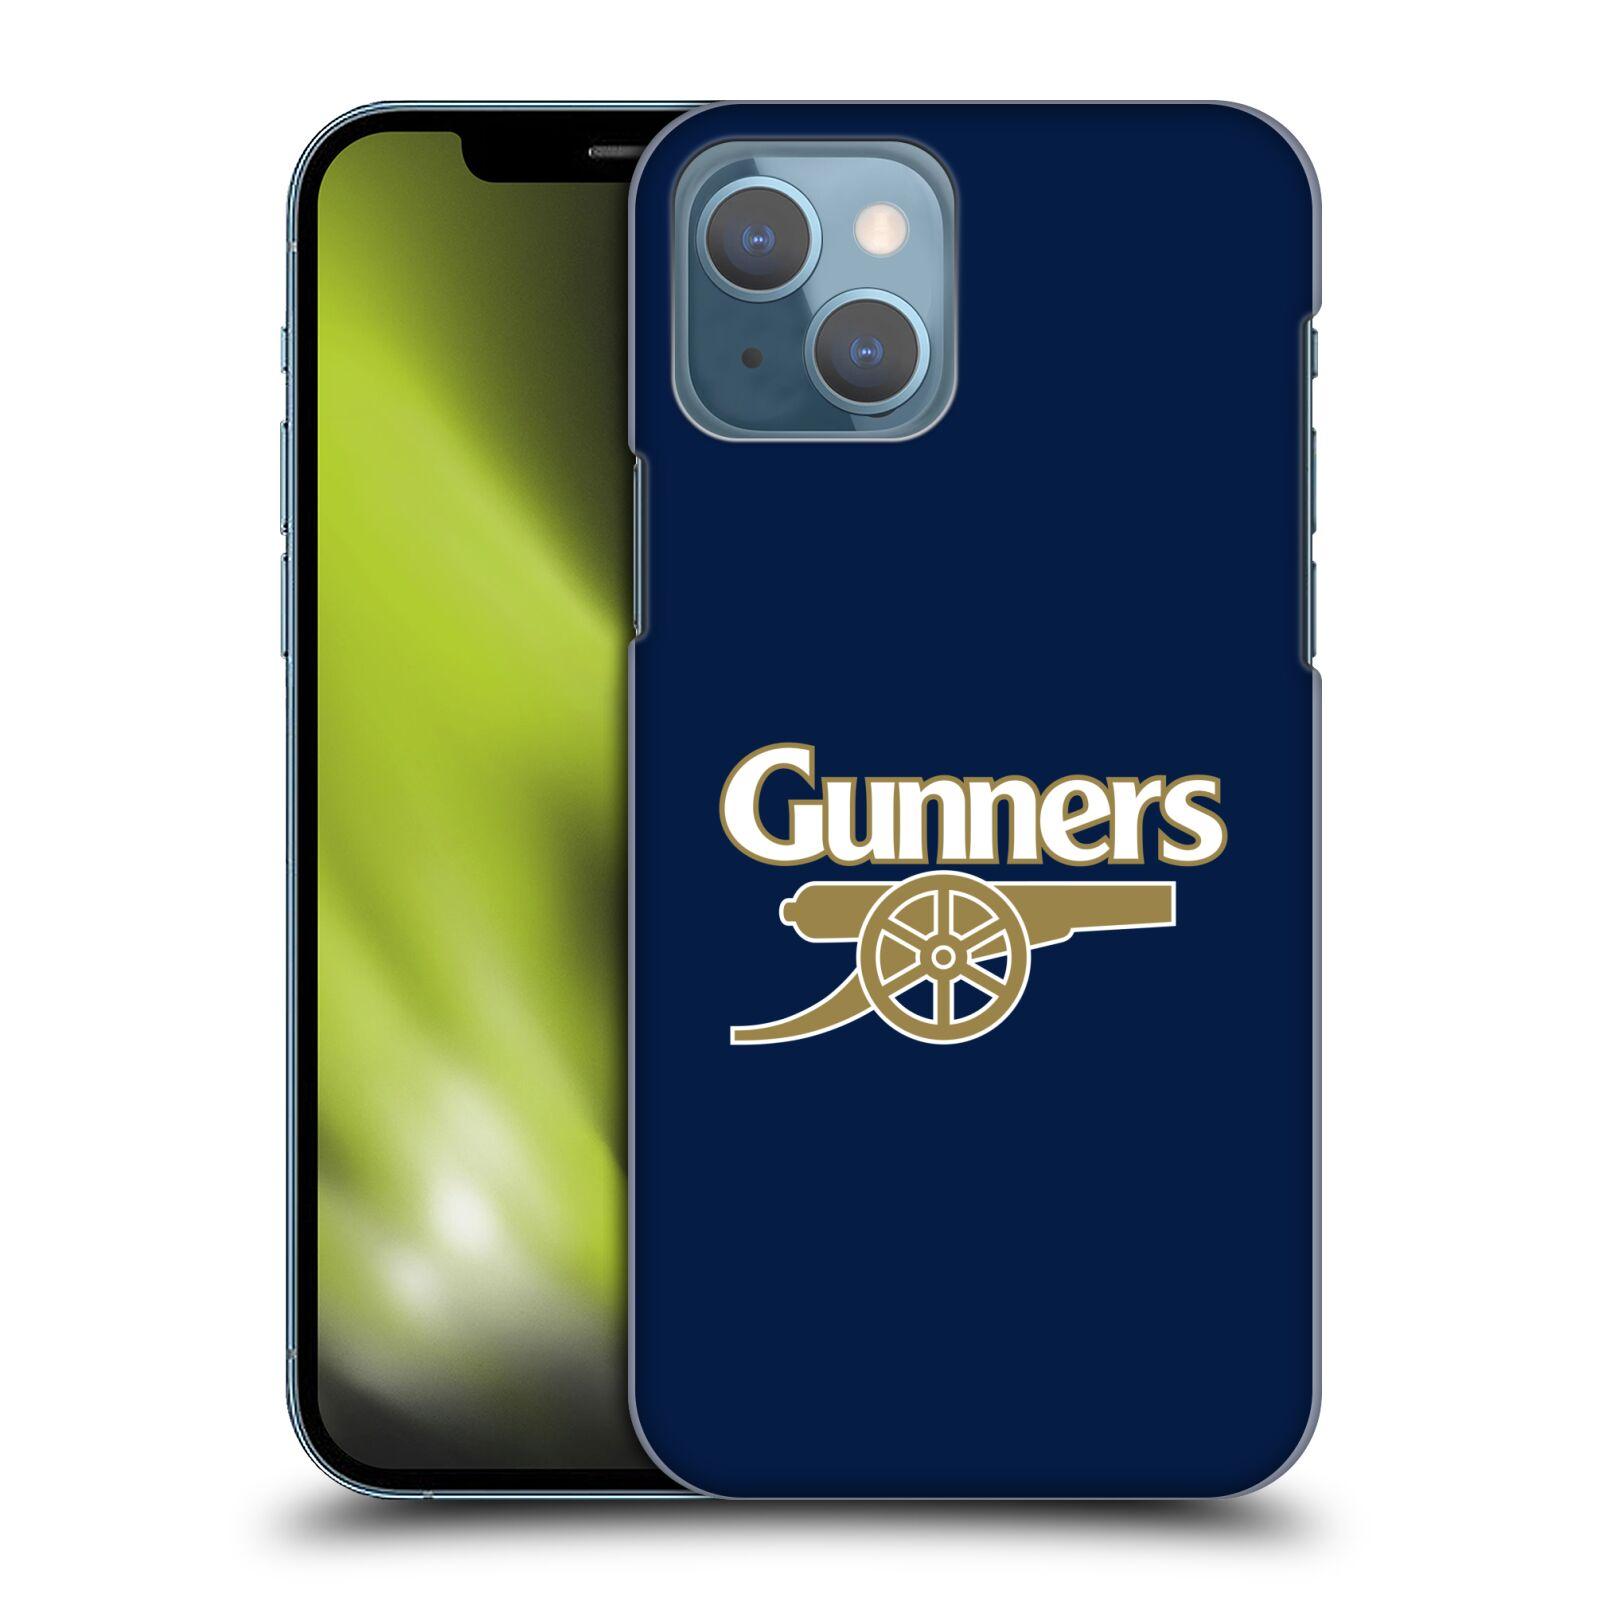 Plastové pouzdro na mobil Apple iPhone 13 - Head Case - Arsenal FC - Gunners